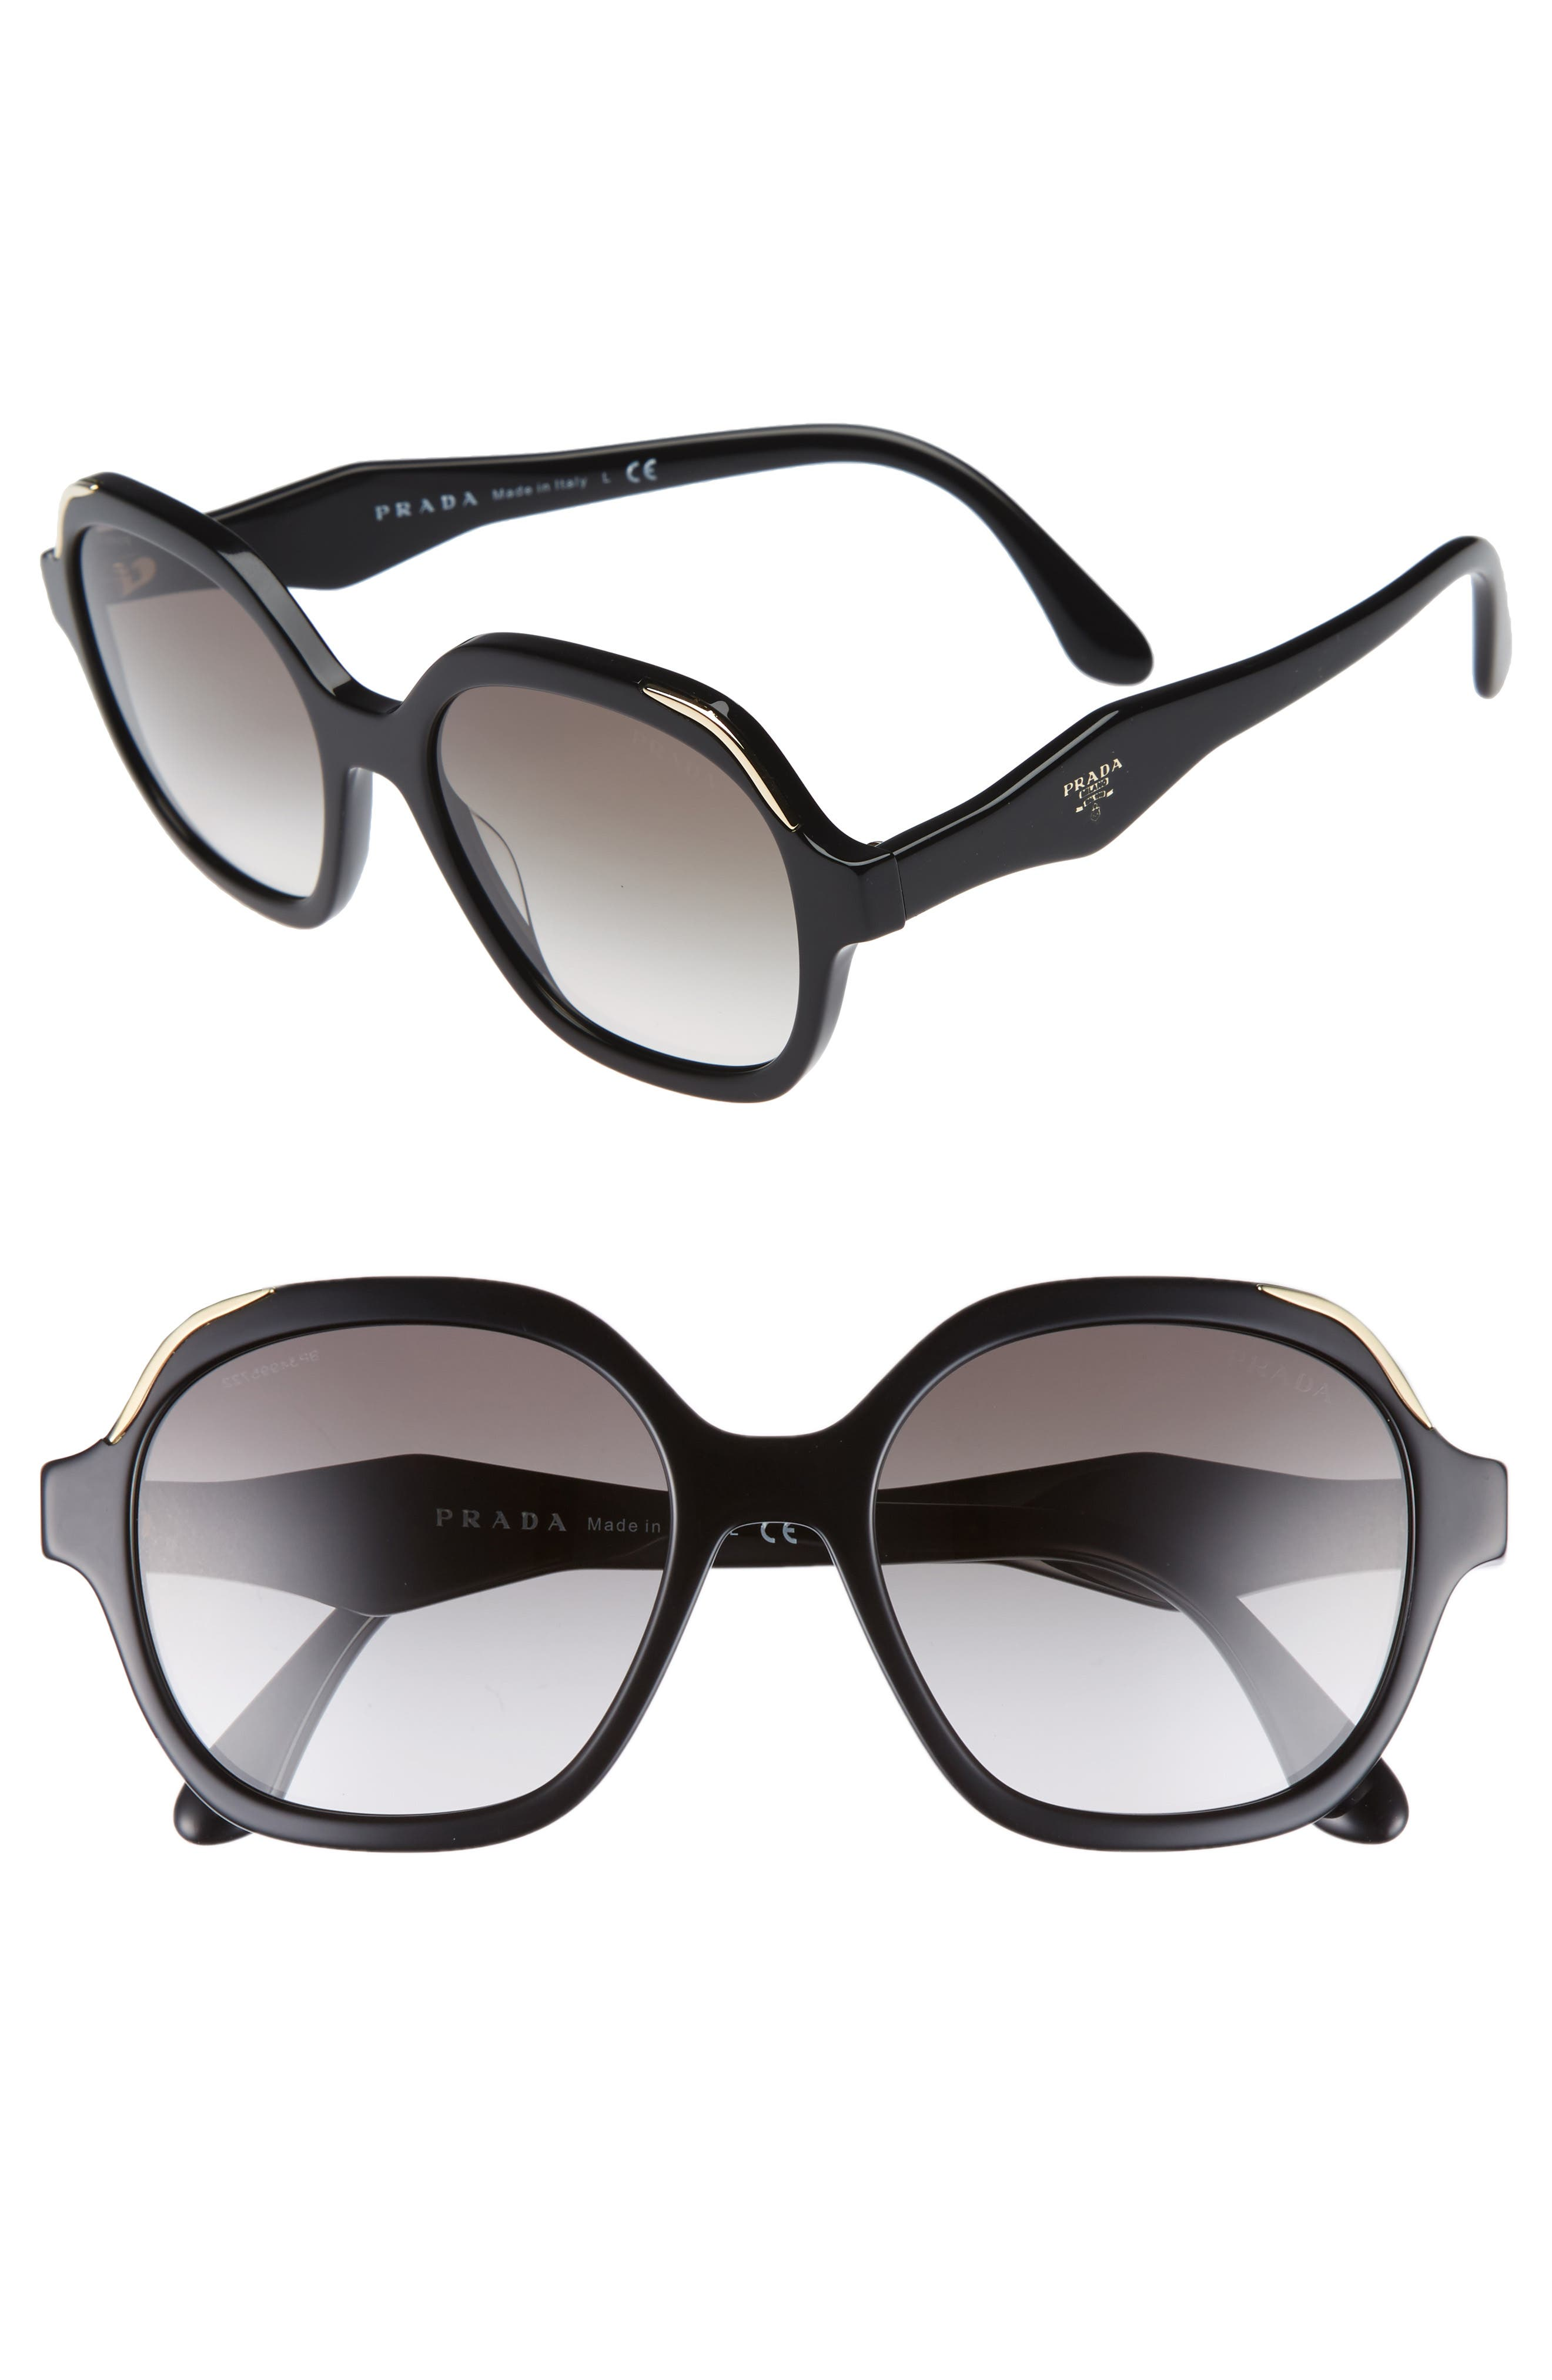 52mm Geometric Gradient Sunglasses,                             Main thumbnail 1, color,